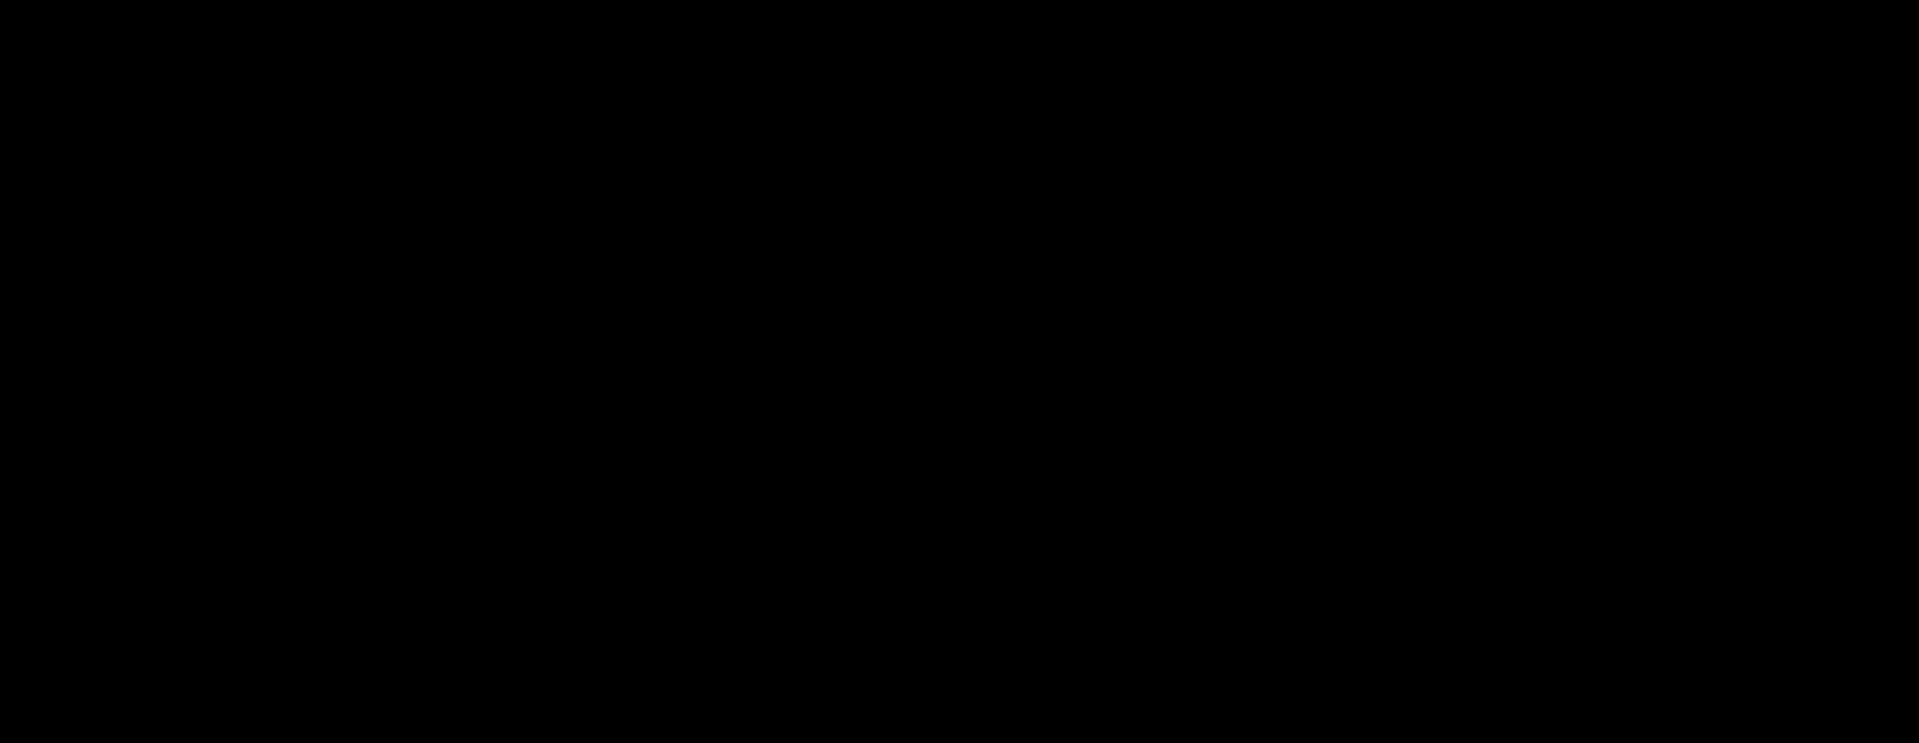 bres-bret-black